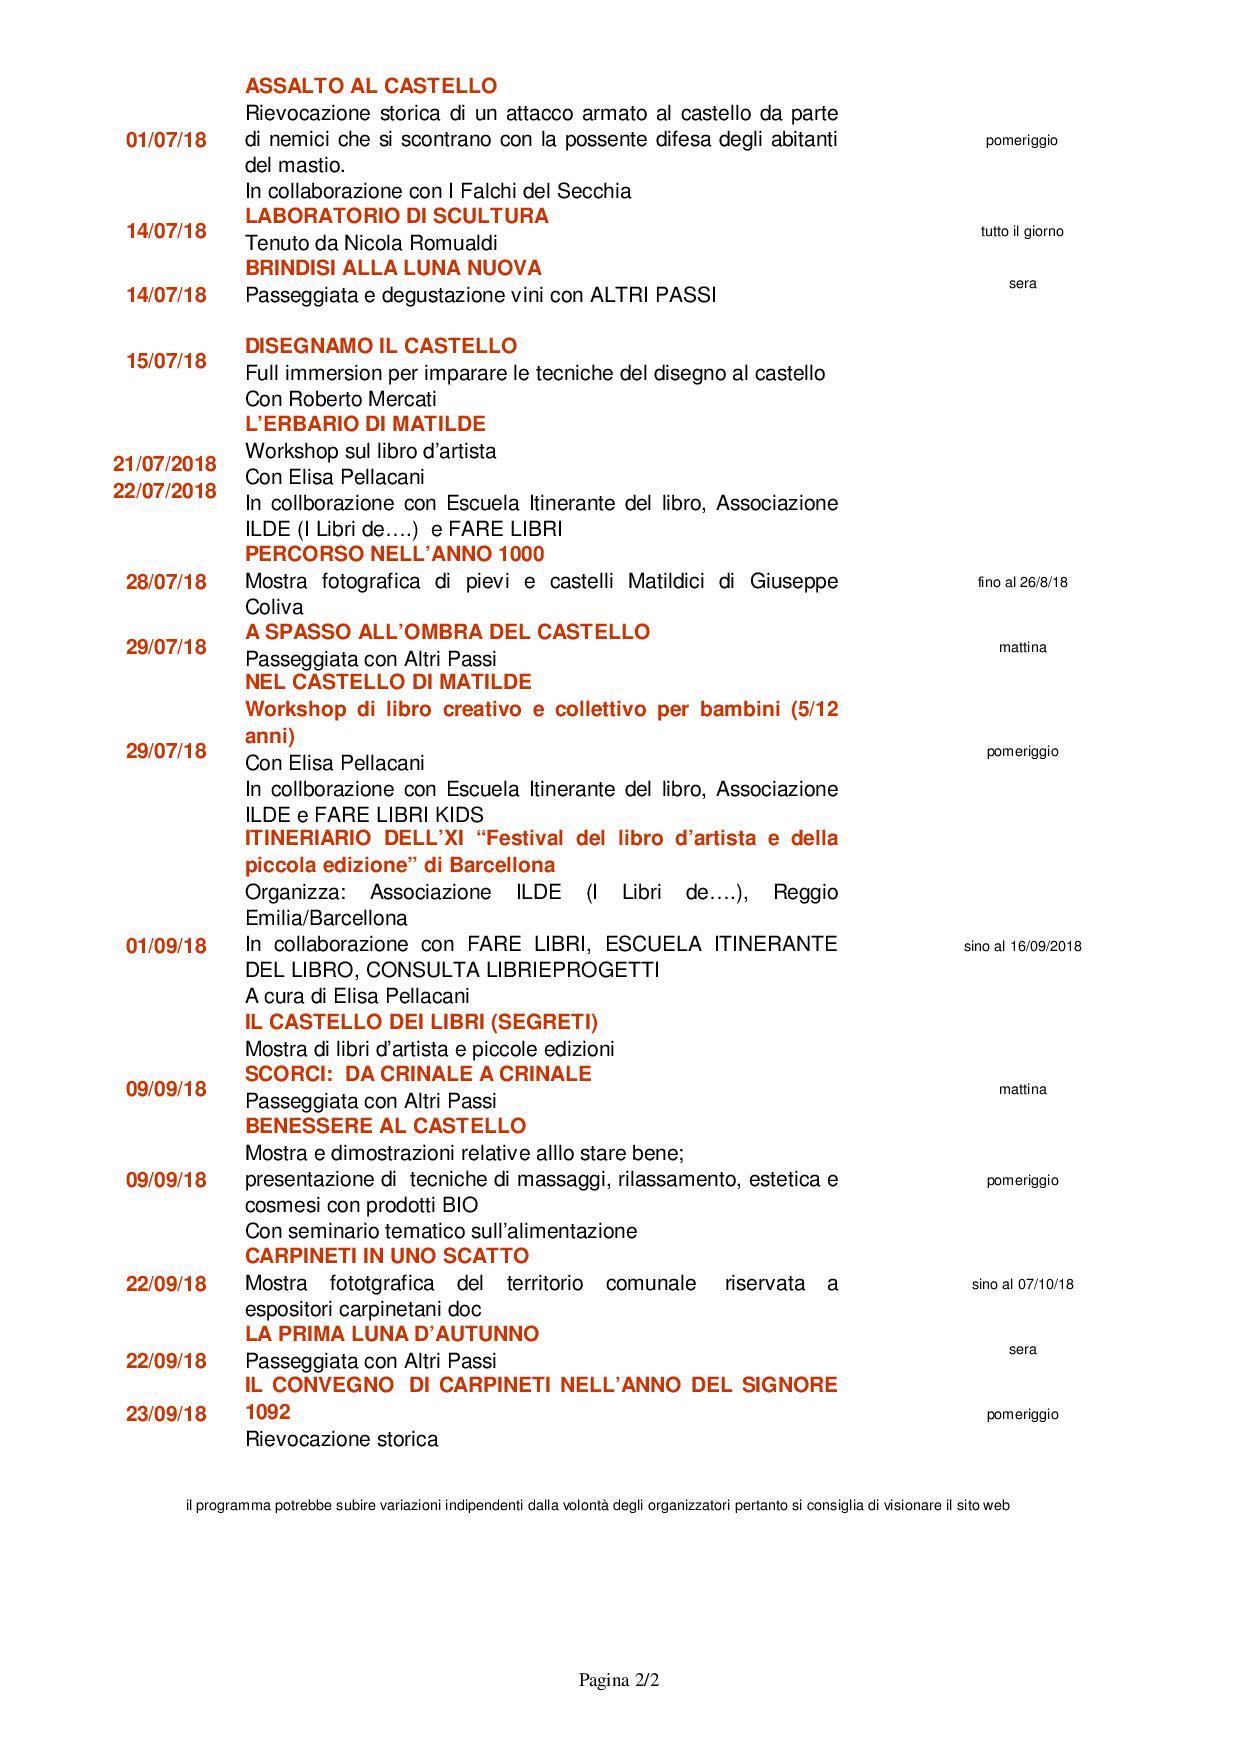 calendario eventi2